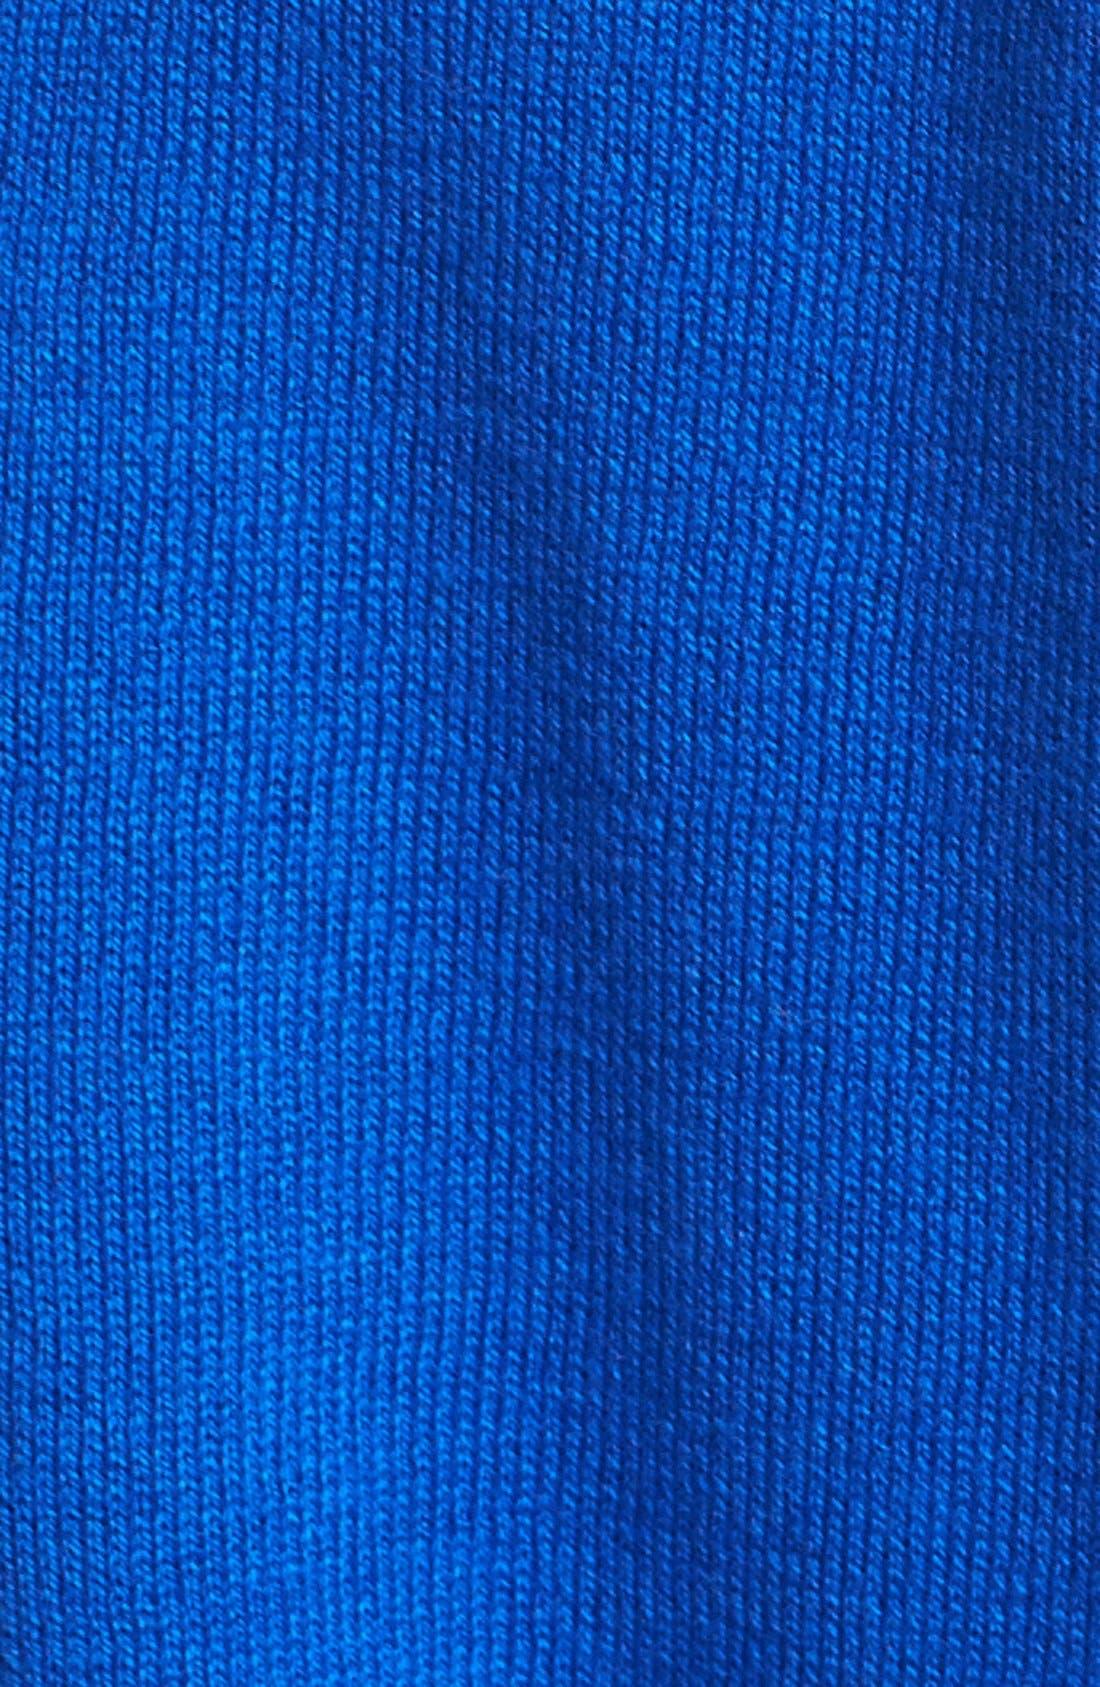 Alternate Image 3  - Vince Camuto Vertical Stripe Colorblock Cotton Blend Sweater